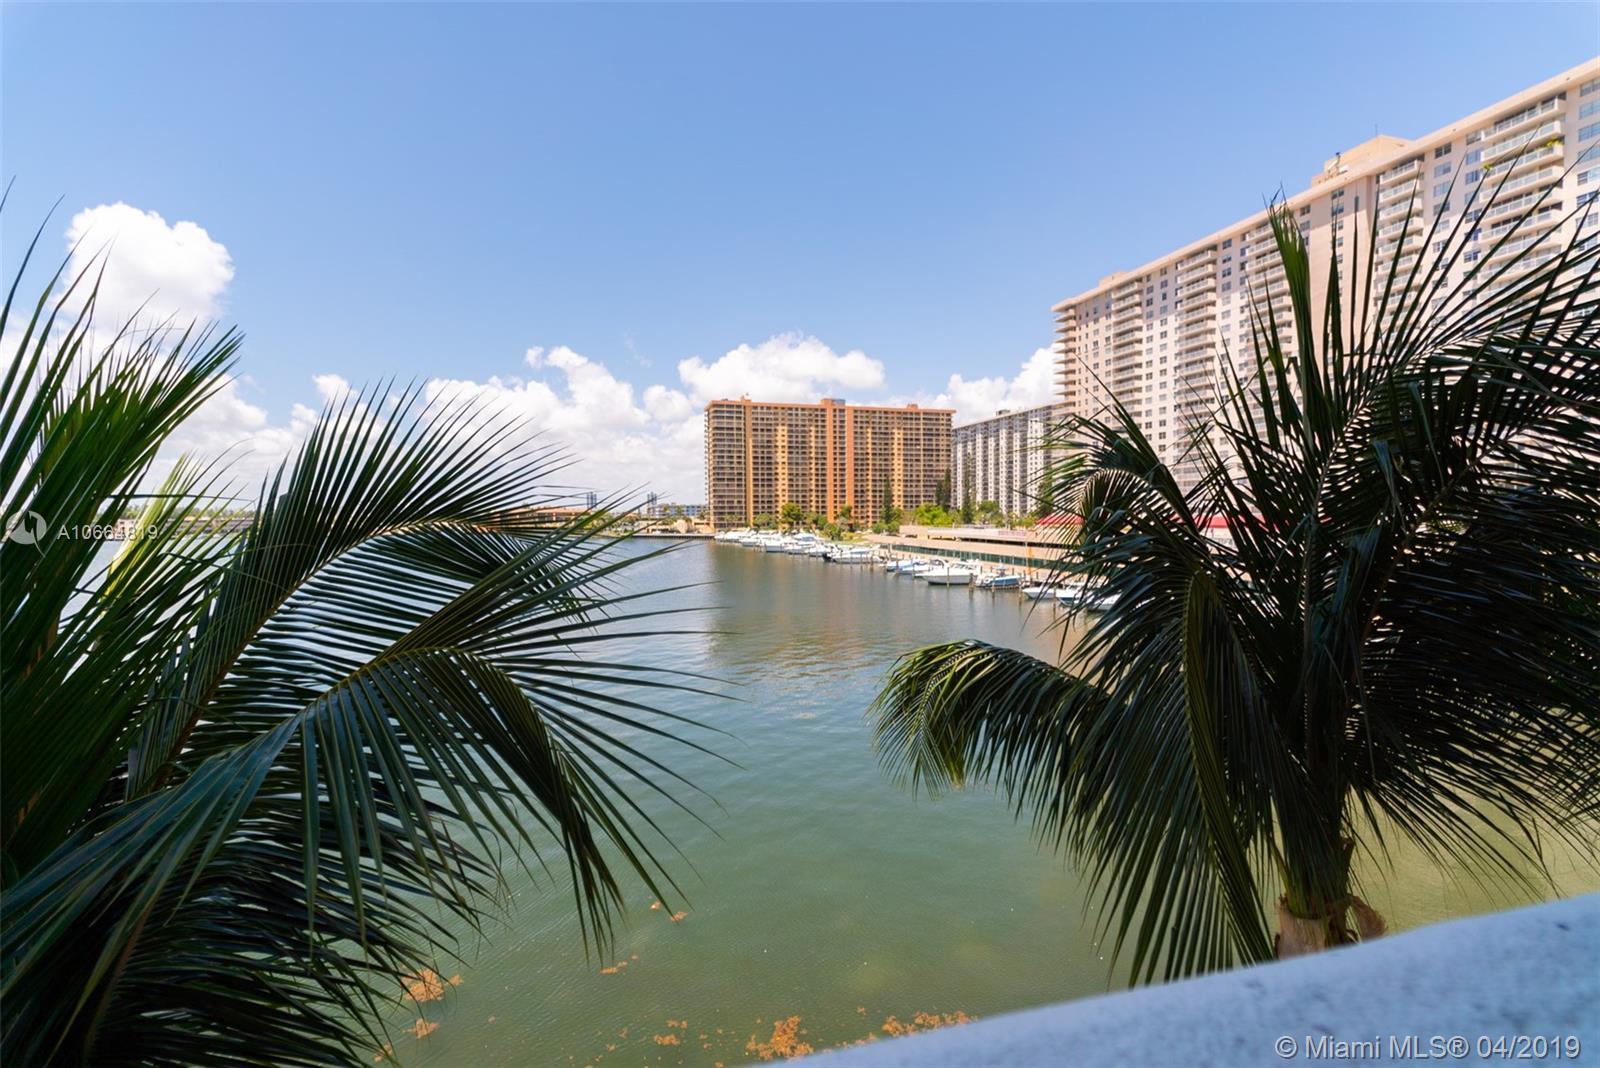 17150 N Bay Rd #2407, Sunny Isles Beach FL 33160